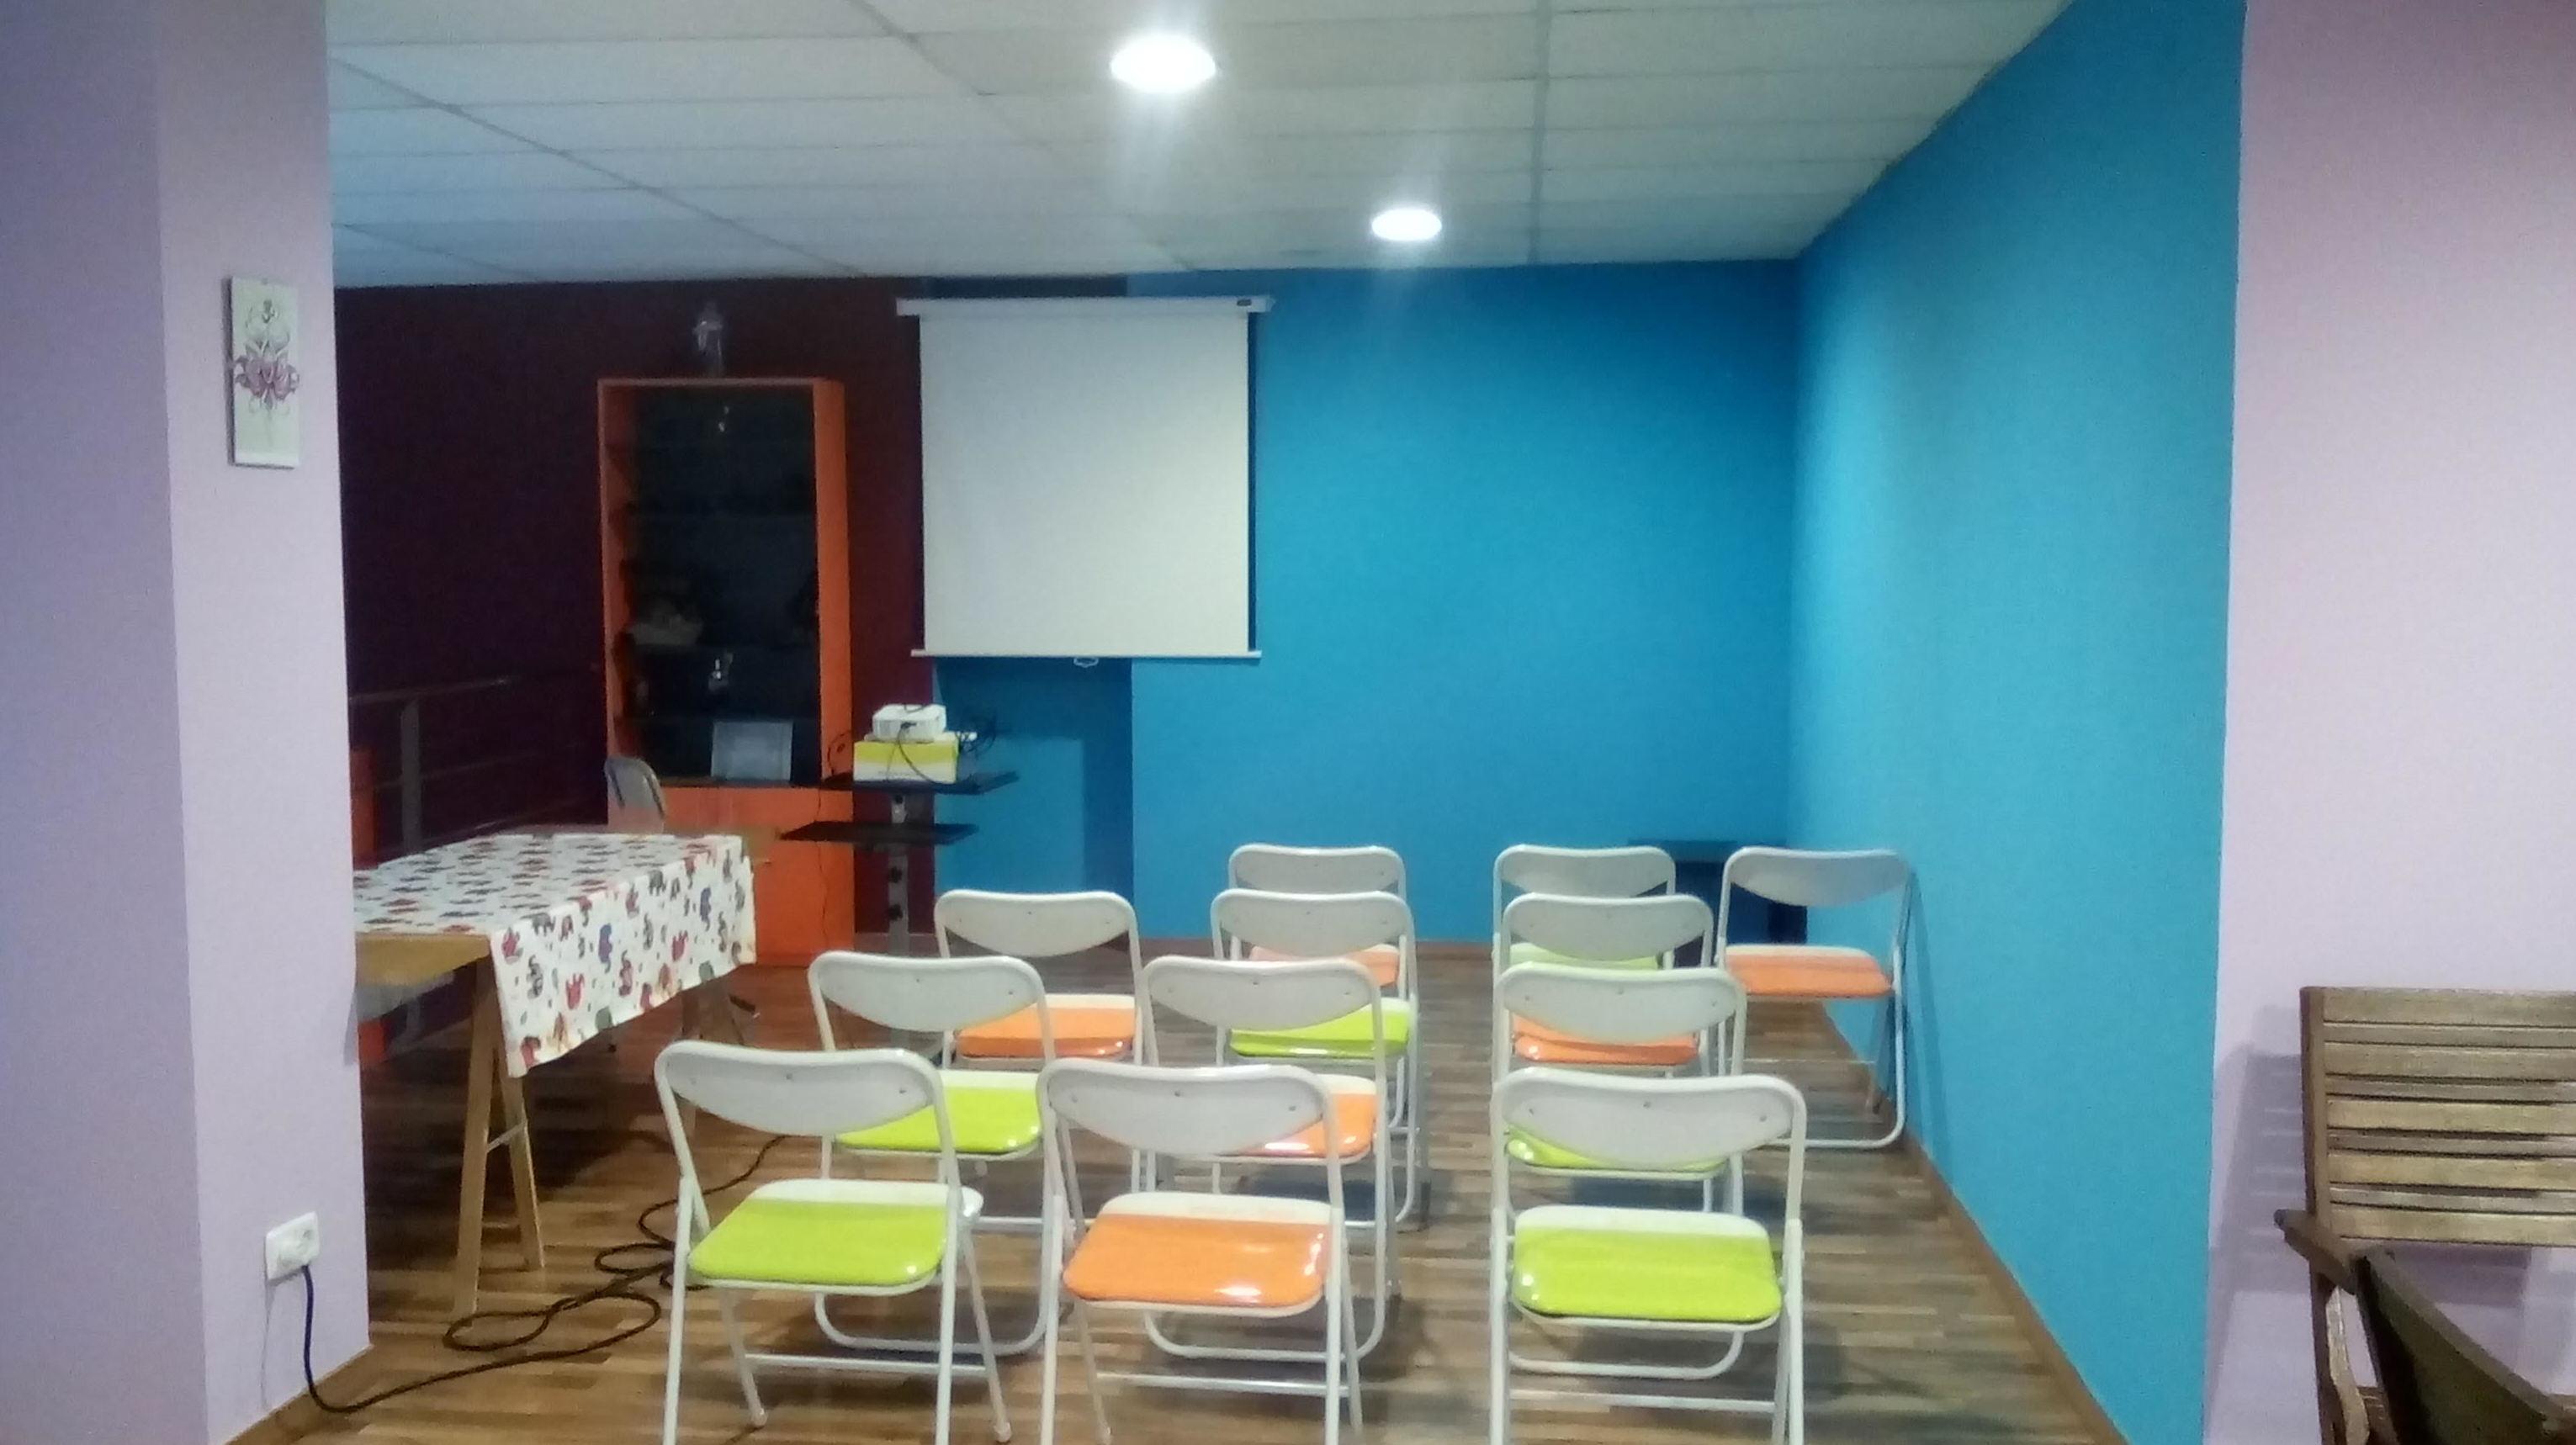 Foto 12 de Centro de terapias naturales en Manresa | Vital S&B